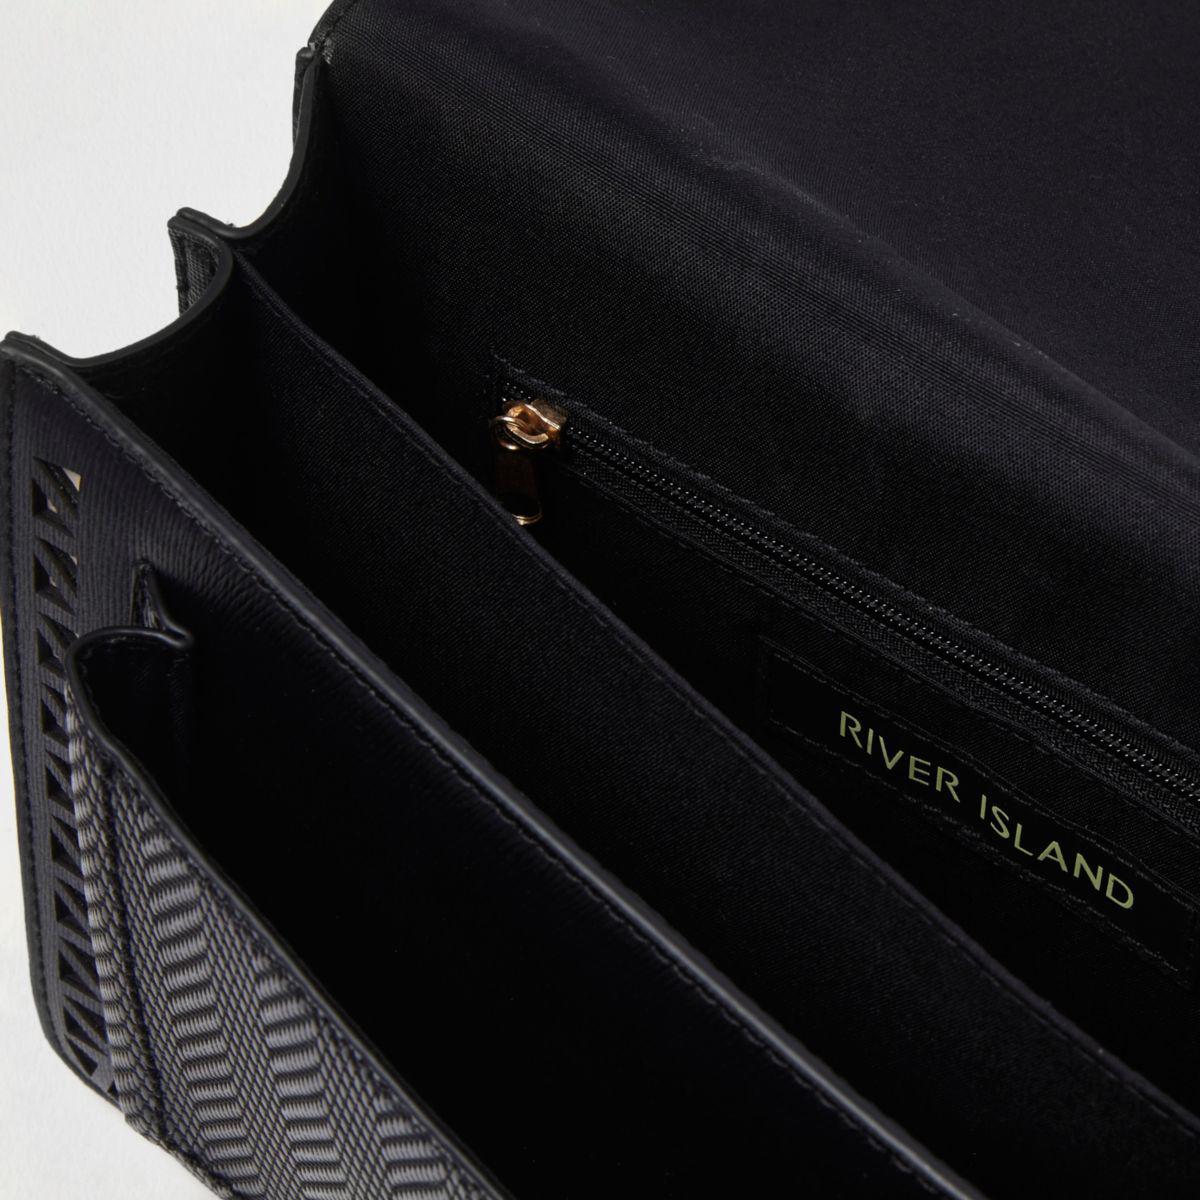 River Island Black Laser Cut Eyelet Stud Cross Body Bag Black Laser Cut Eyelet Stud Cross Body Bag